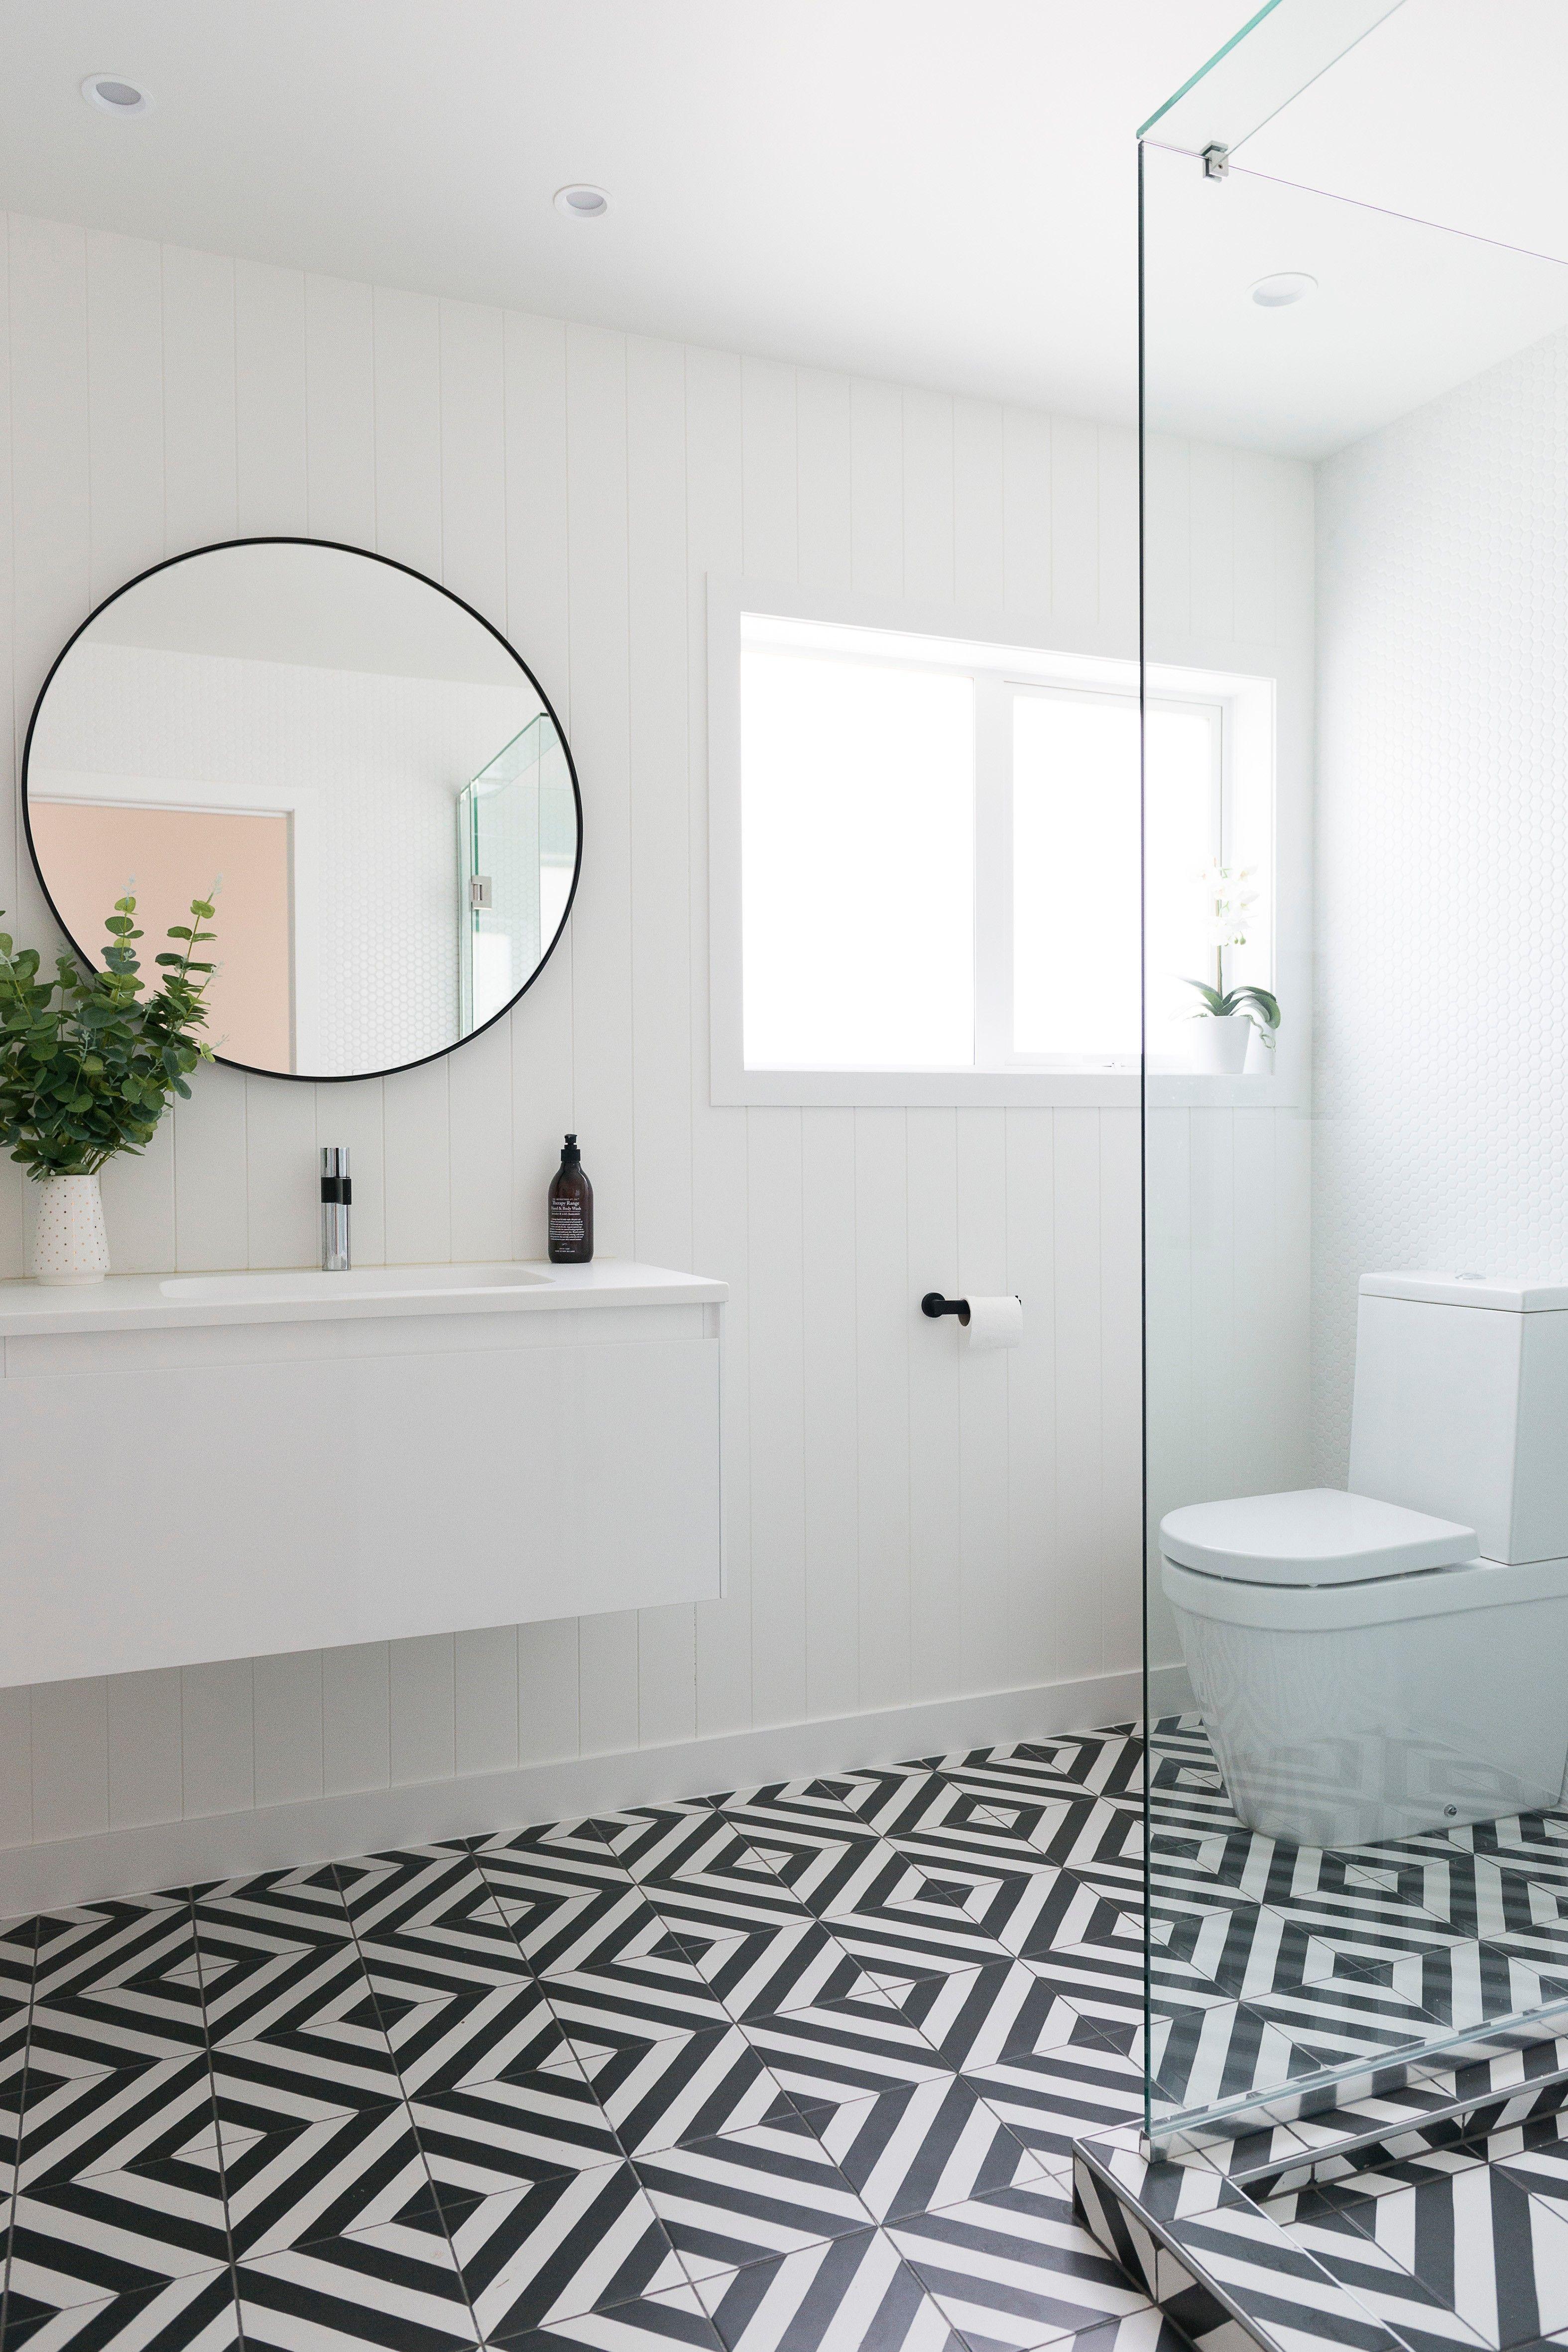 Goroka Grafito 20 Black Bathroom Black And White Tiles Bathroom Black And White Bathroom Floor